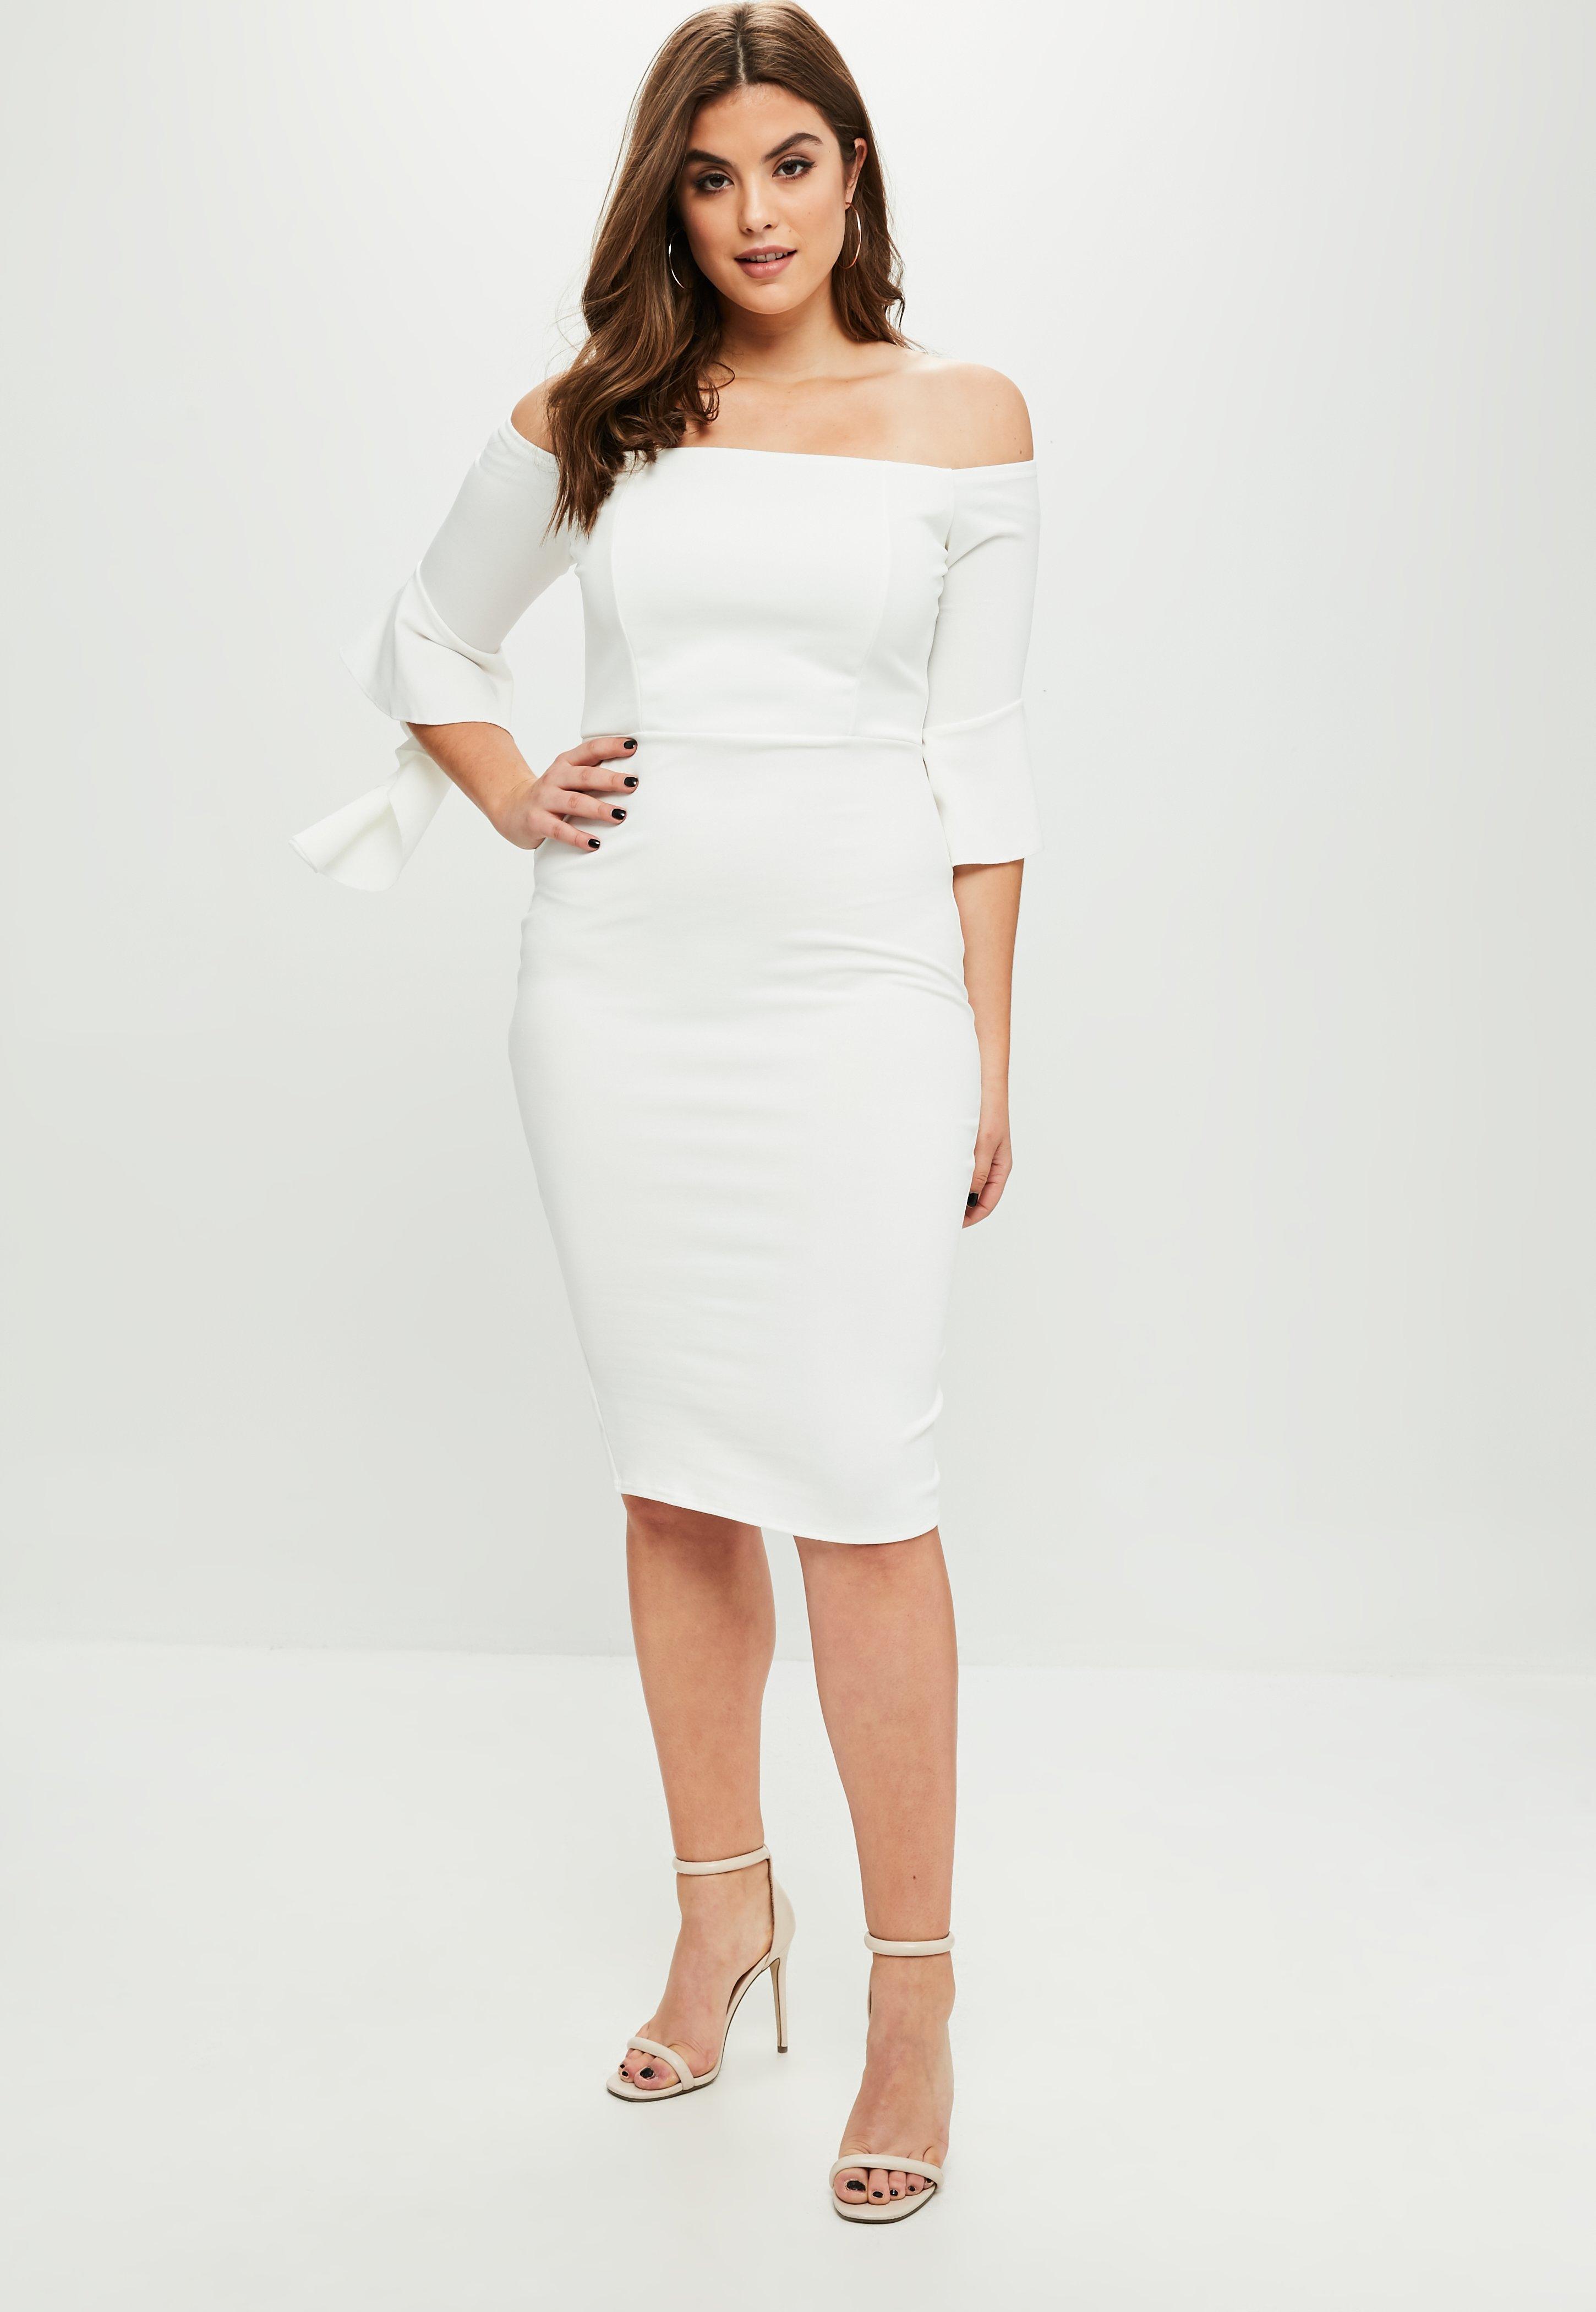 plus size clothing womens plus size fashion missguided